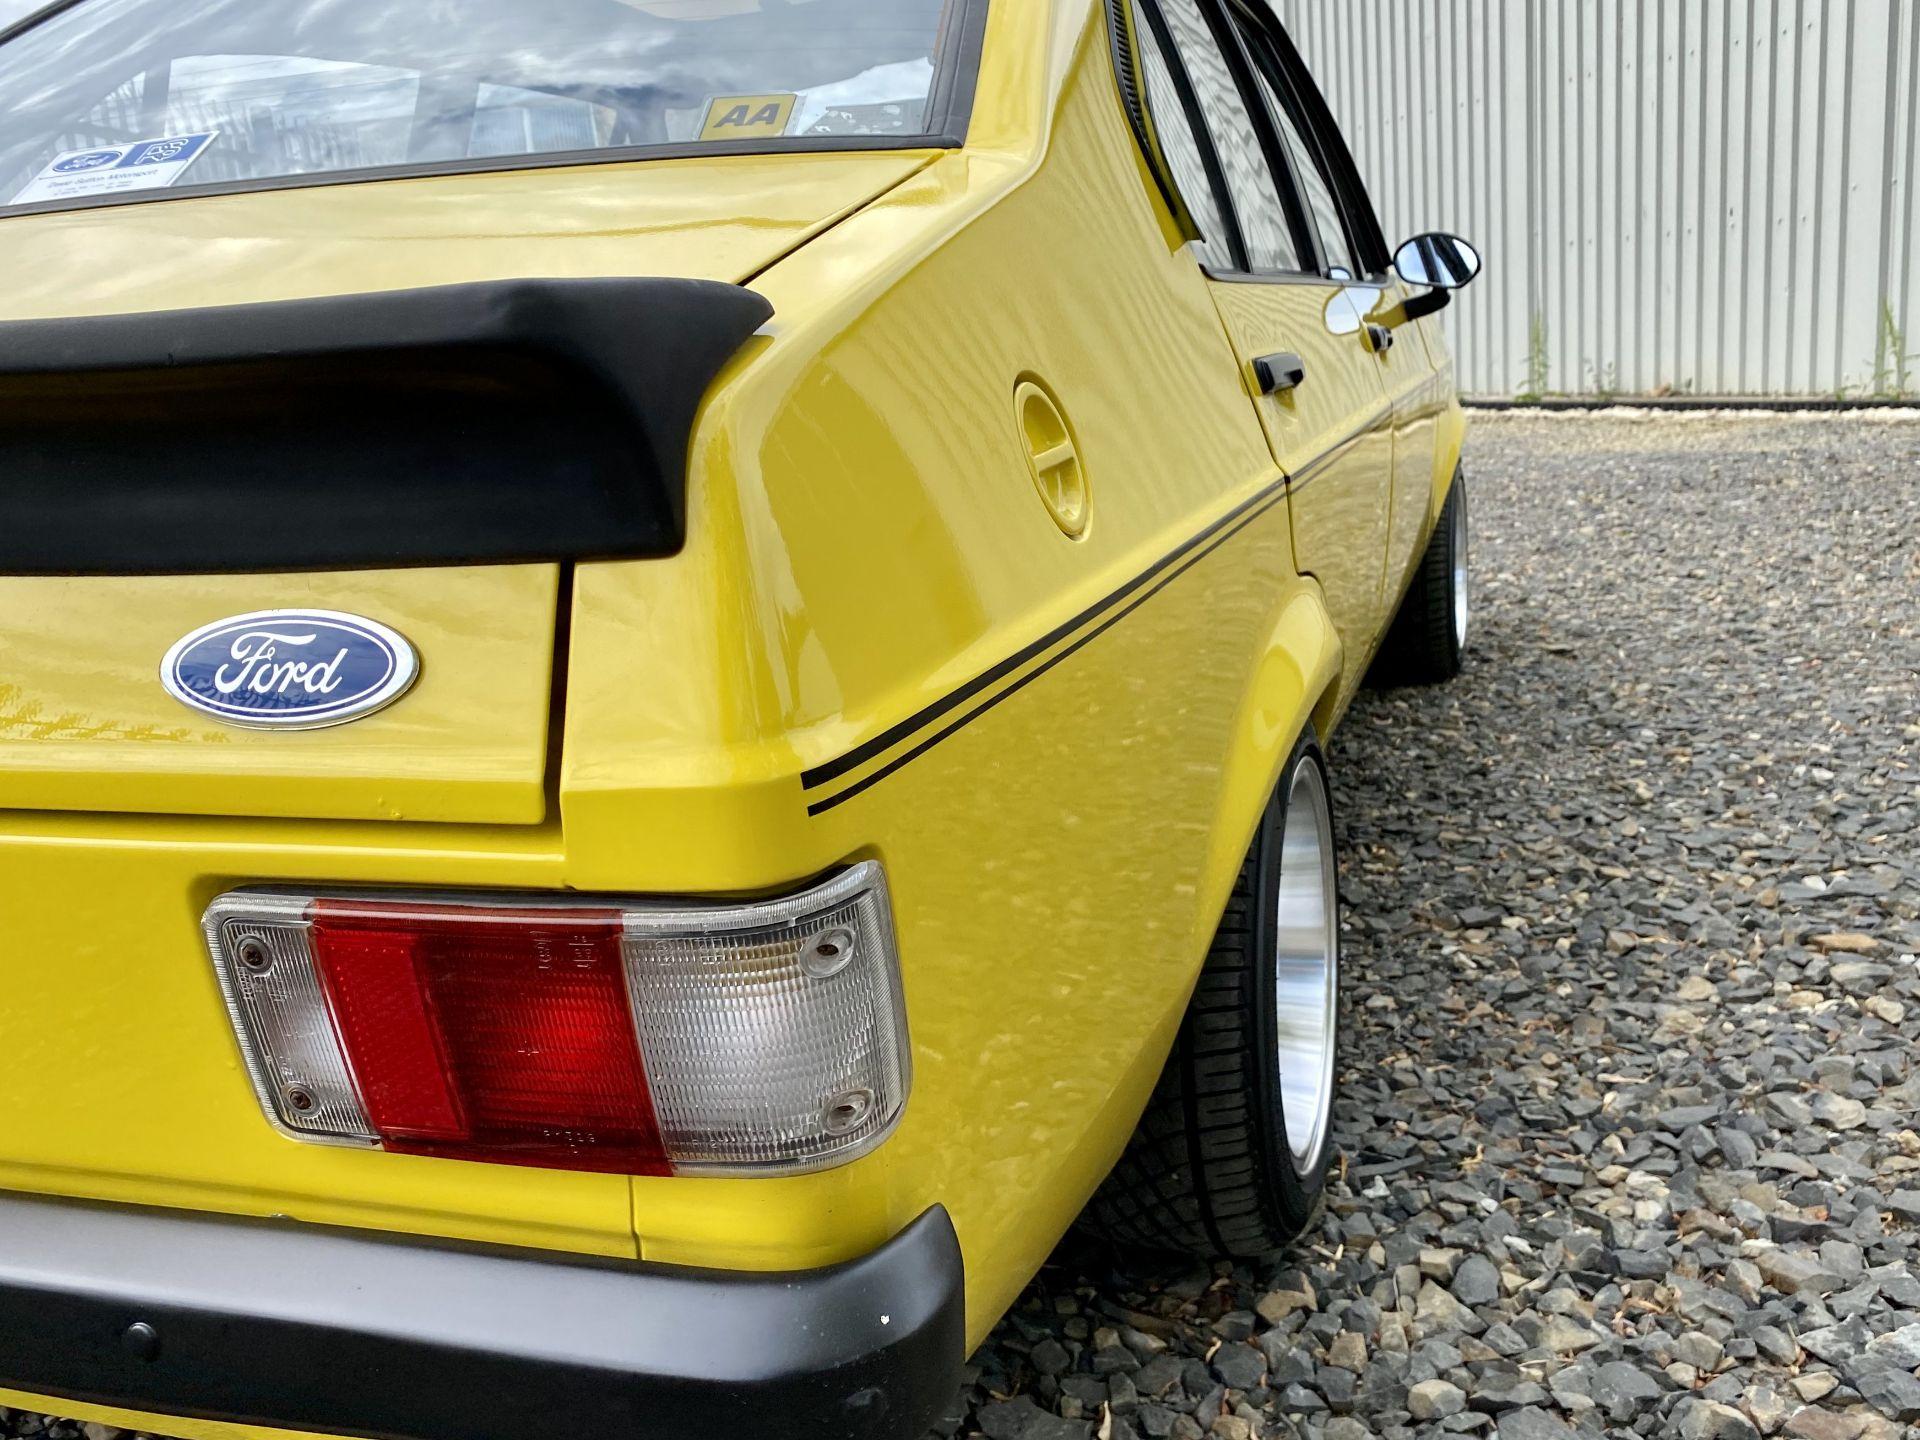 Ford Escort MK2 - Image 19 of 58